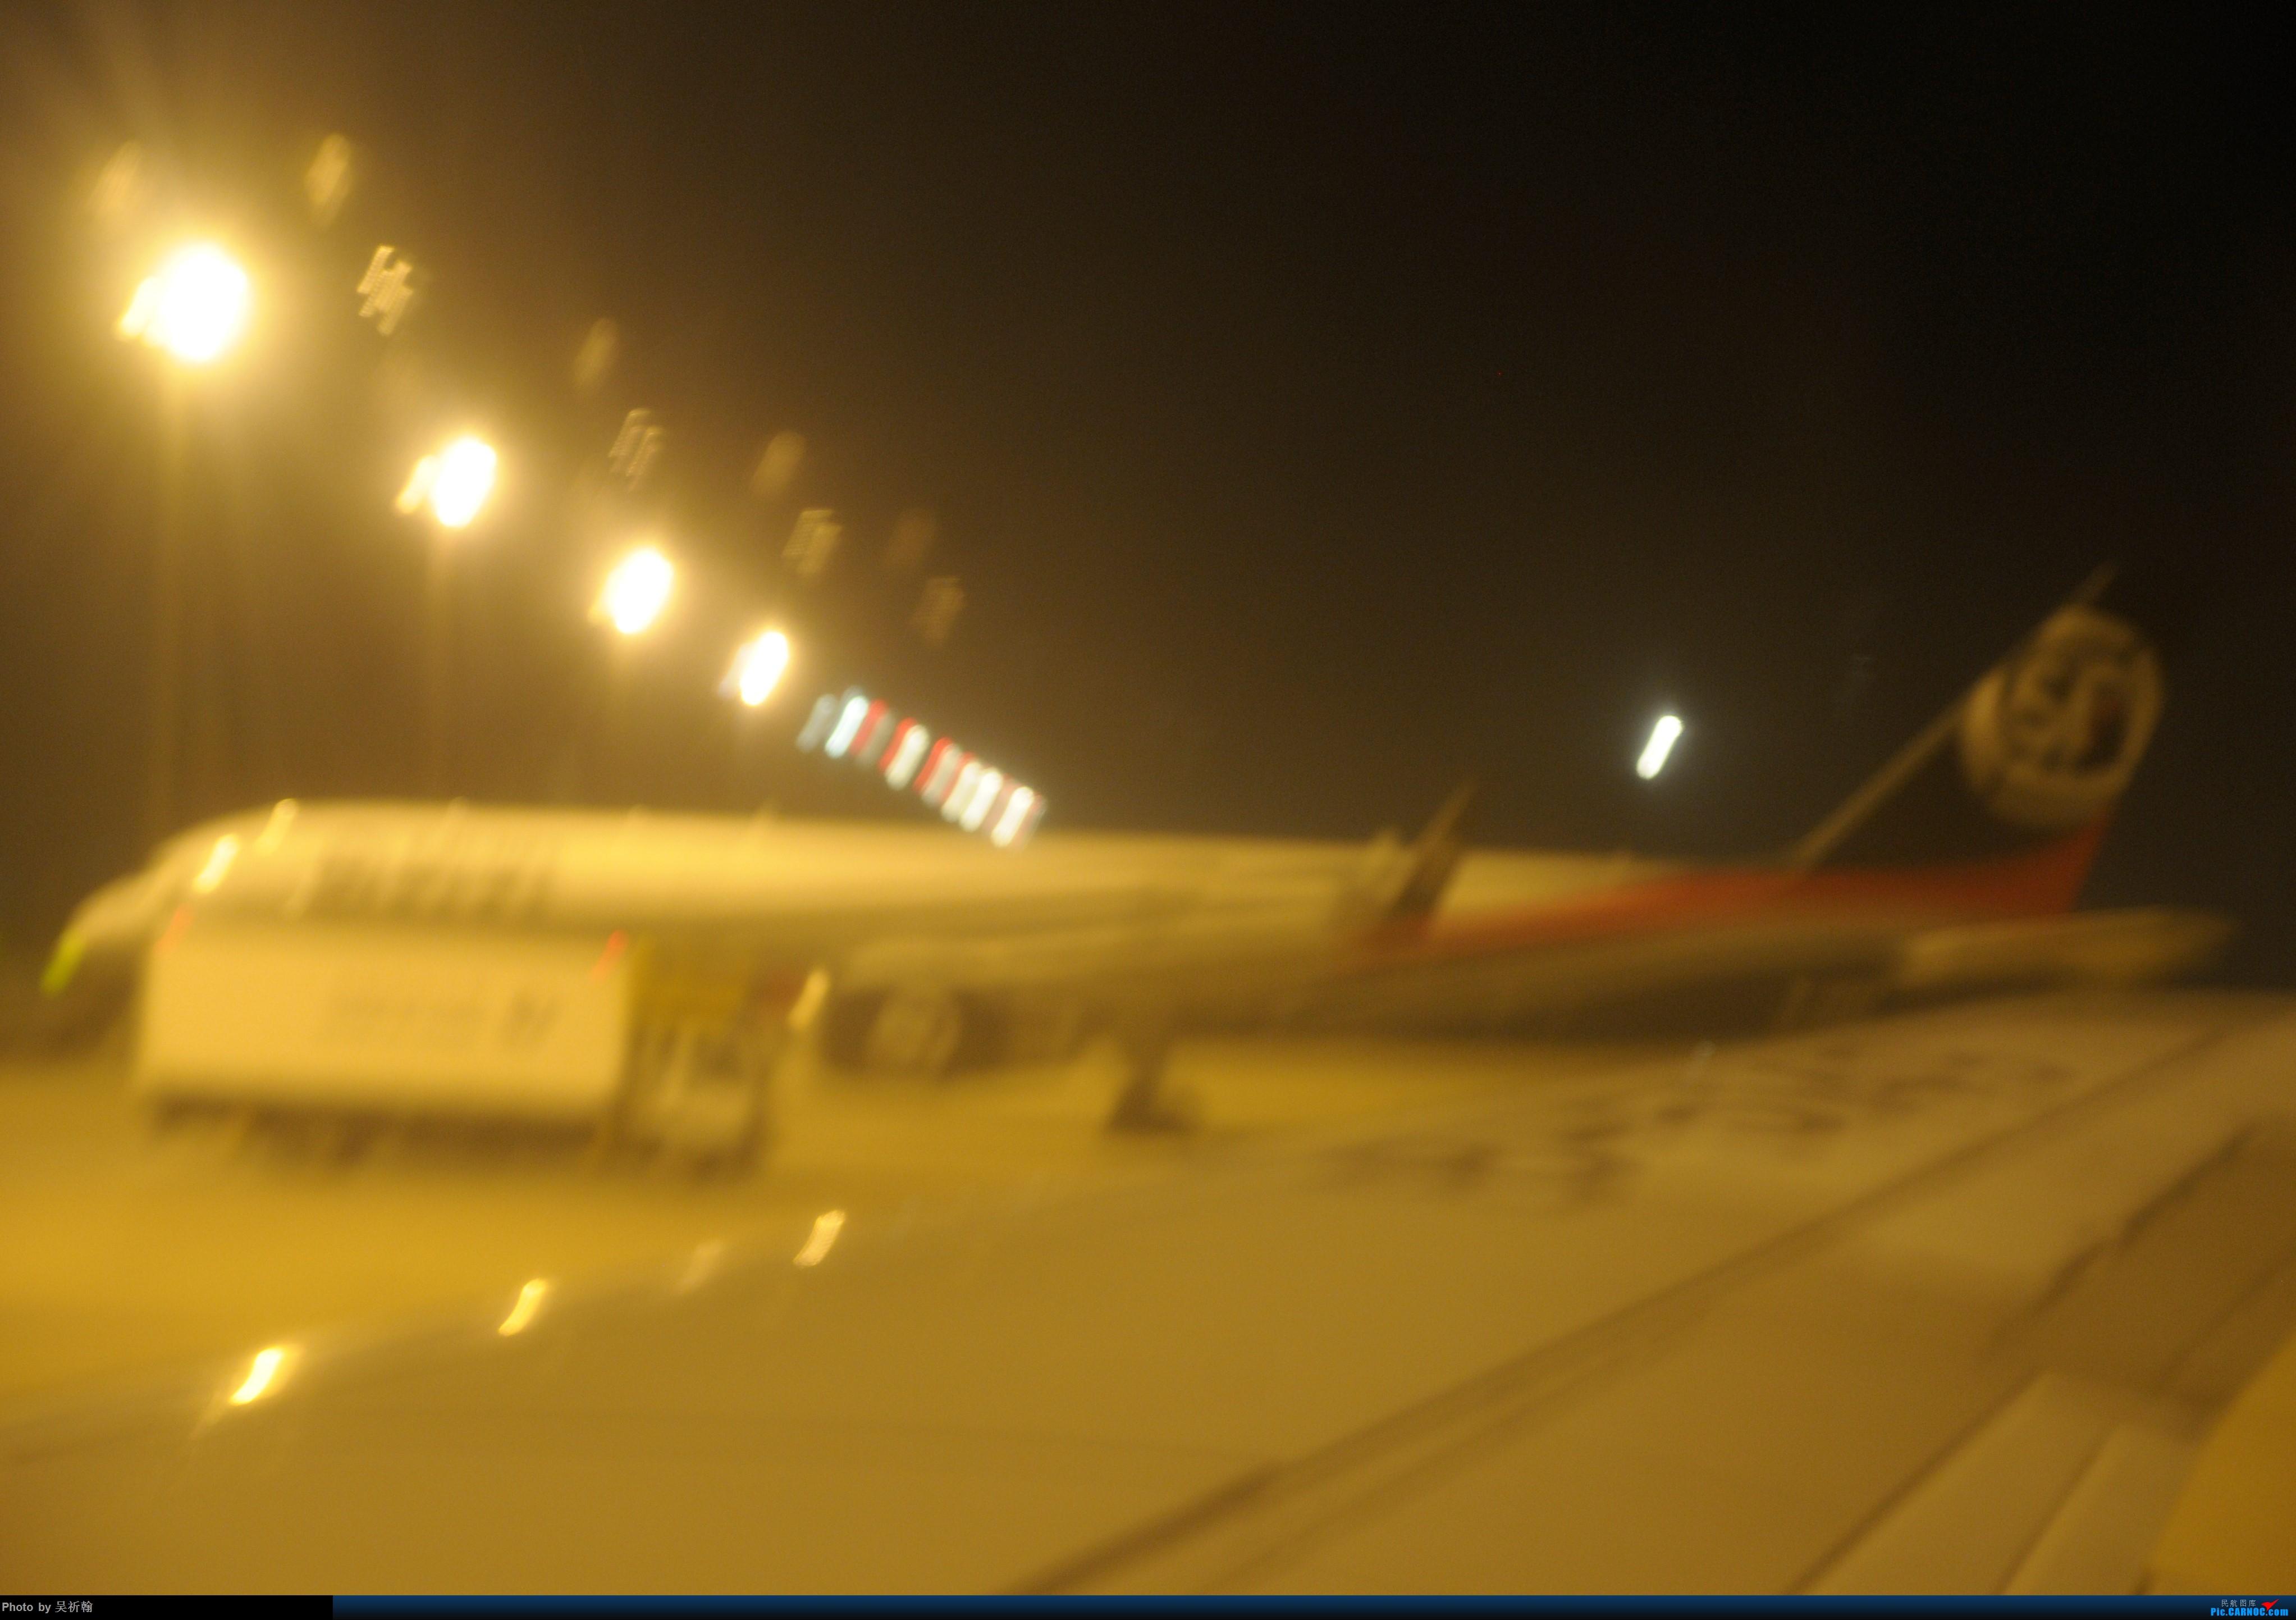 Re:[原创]Kian的飞行游记1:飞往无锡 BOEING 757-200F